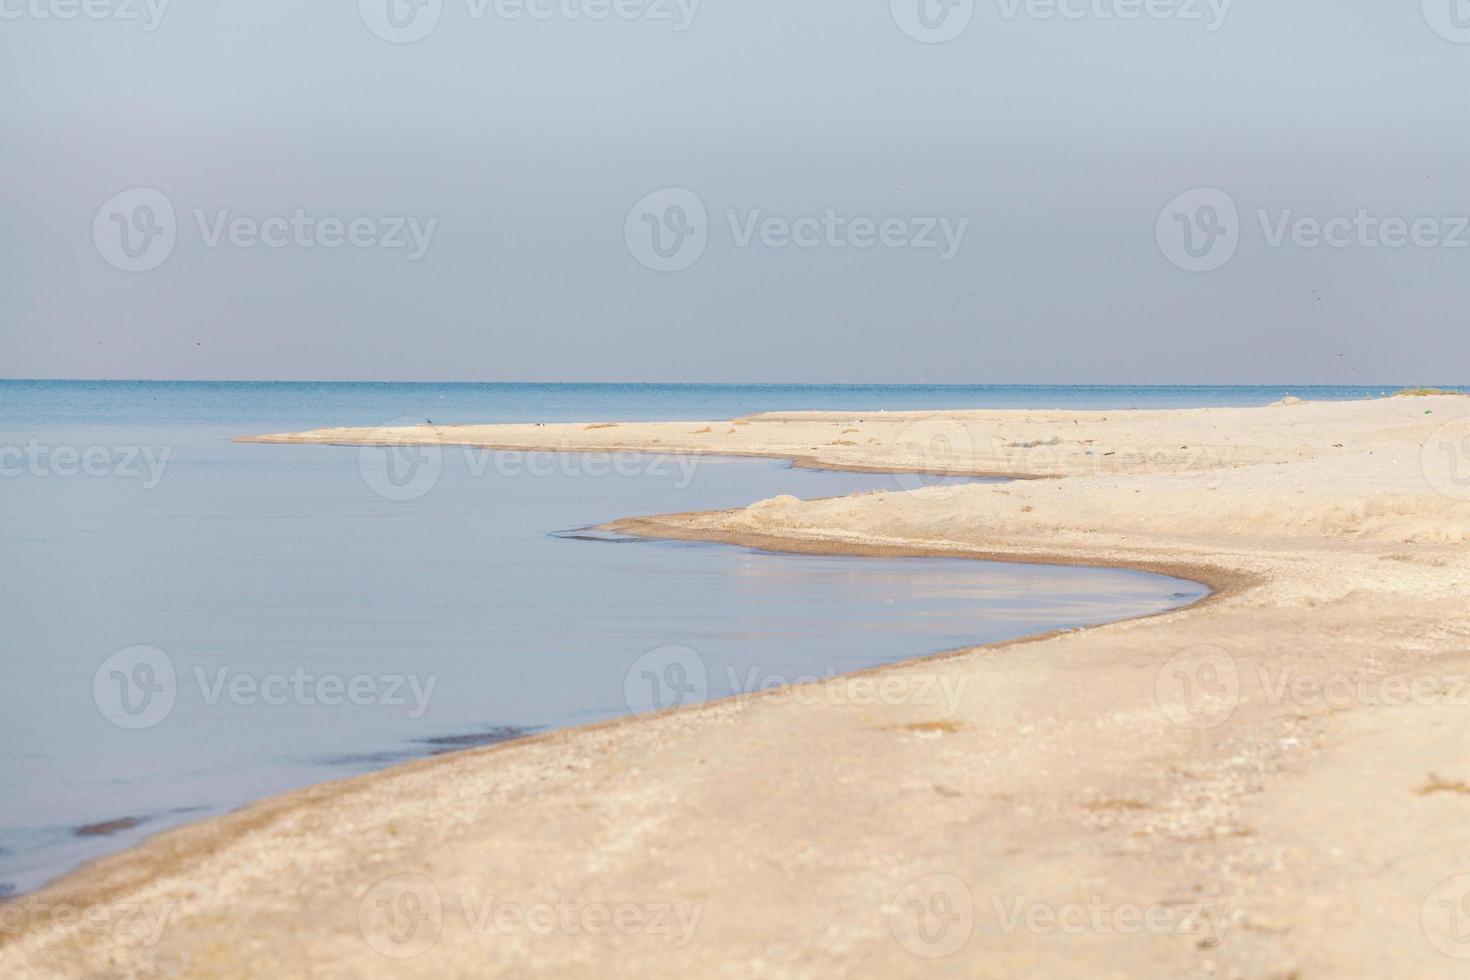 Deserted seascape photo